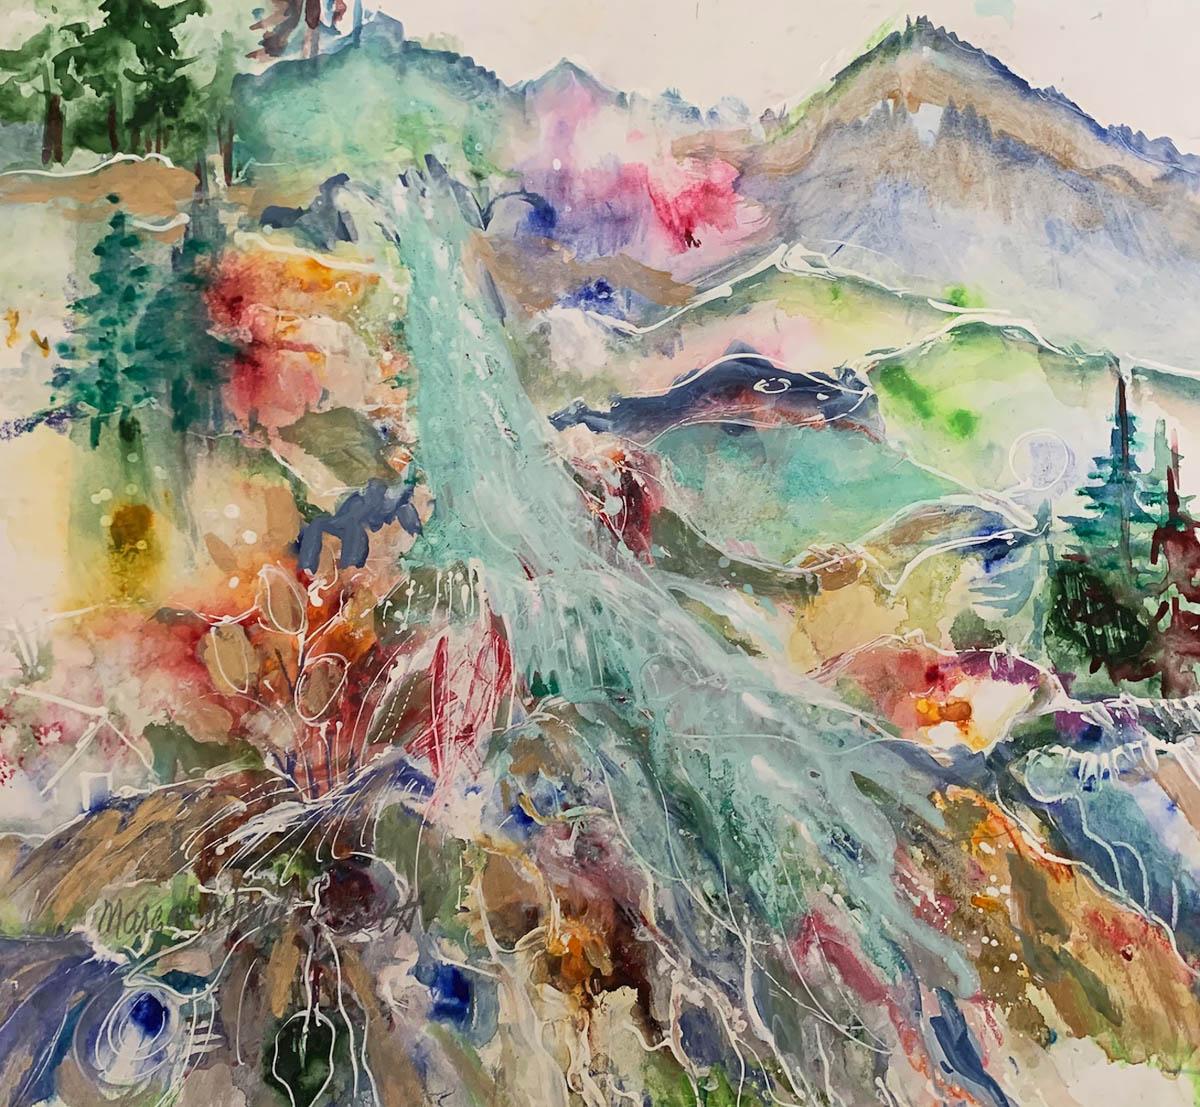 Falling Waters by Margot Mordini